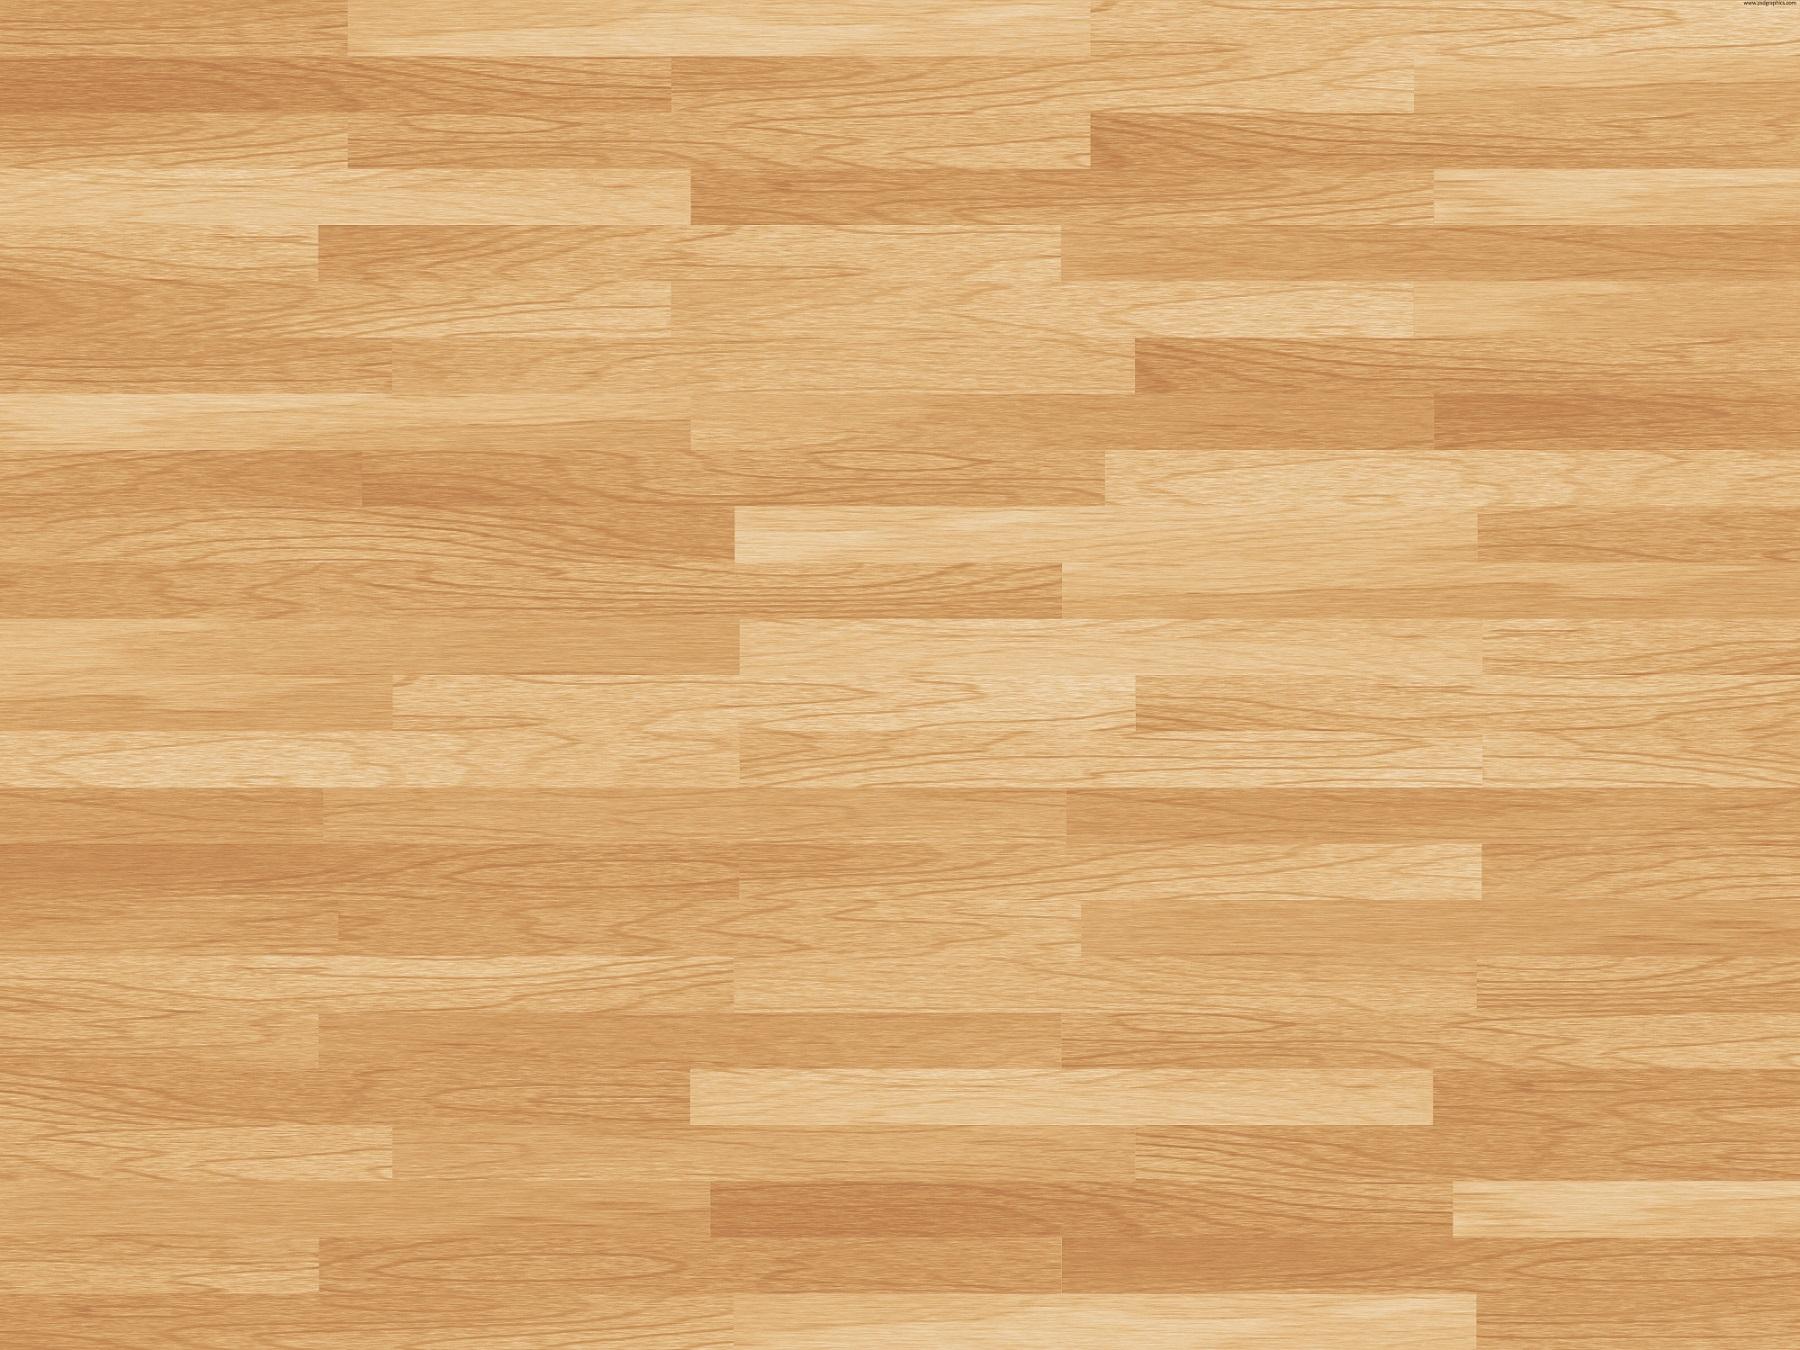 basketball-floor-texture